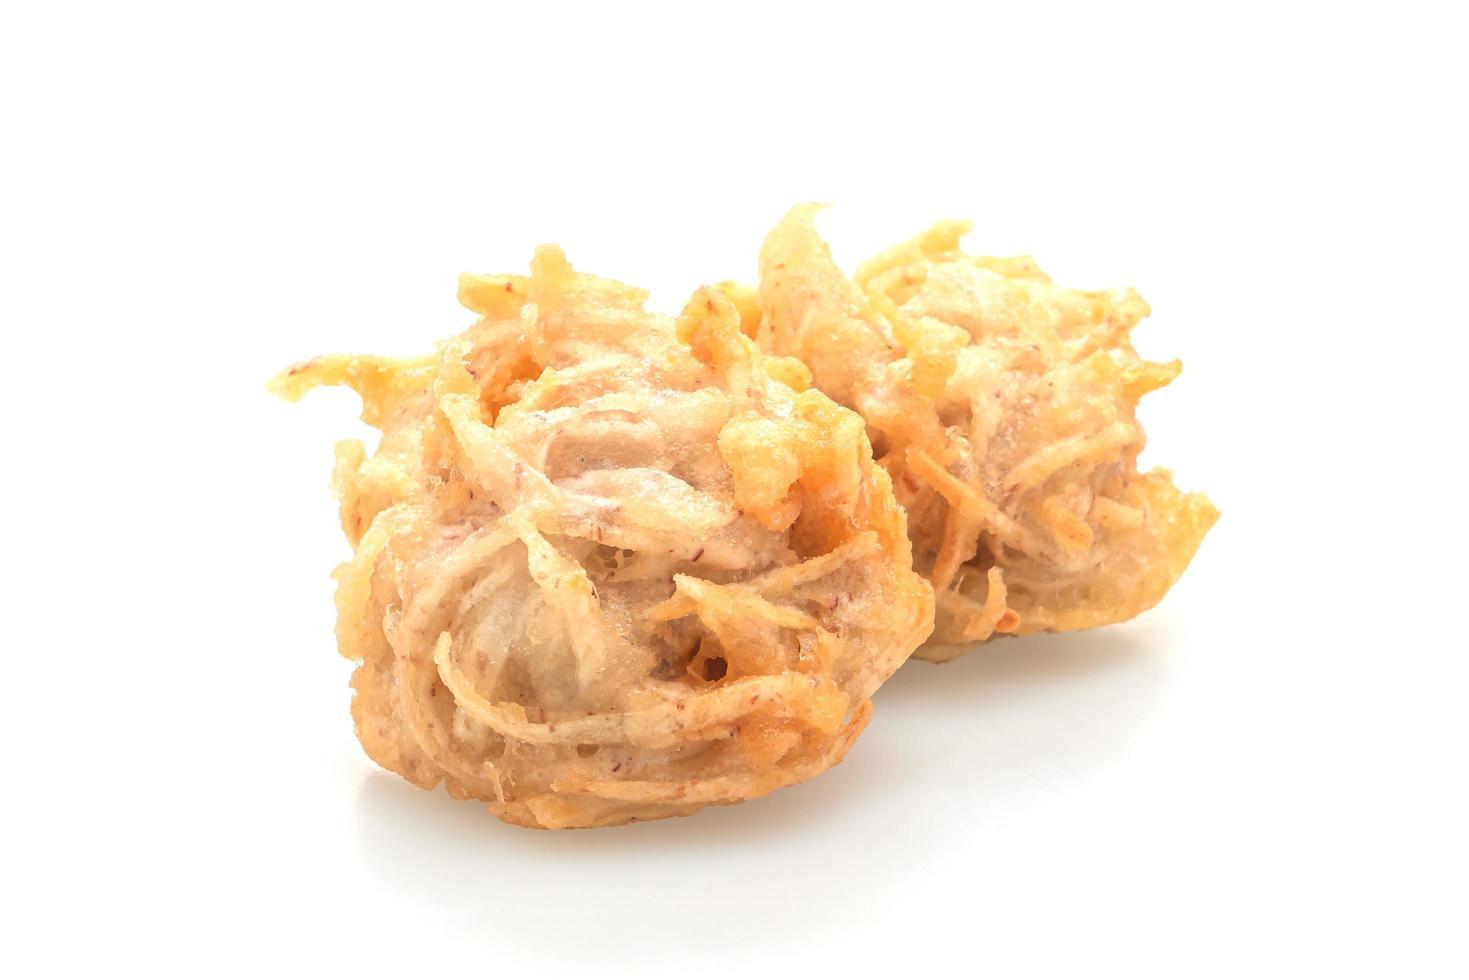 stekt taro isolerad på vit bakgrund - vegansk och vegetarisk matstil foto